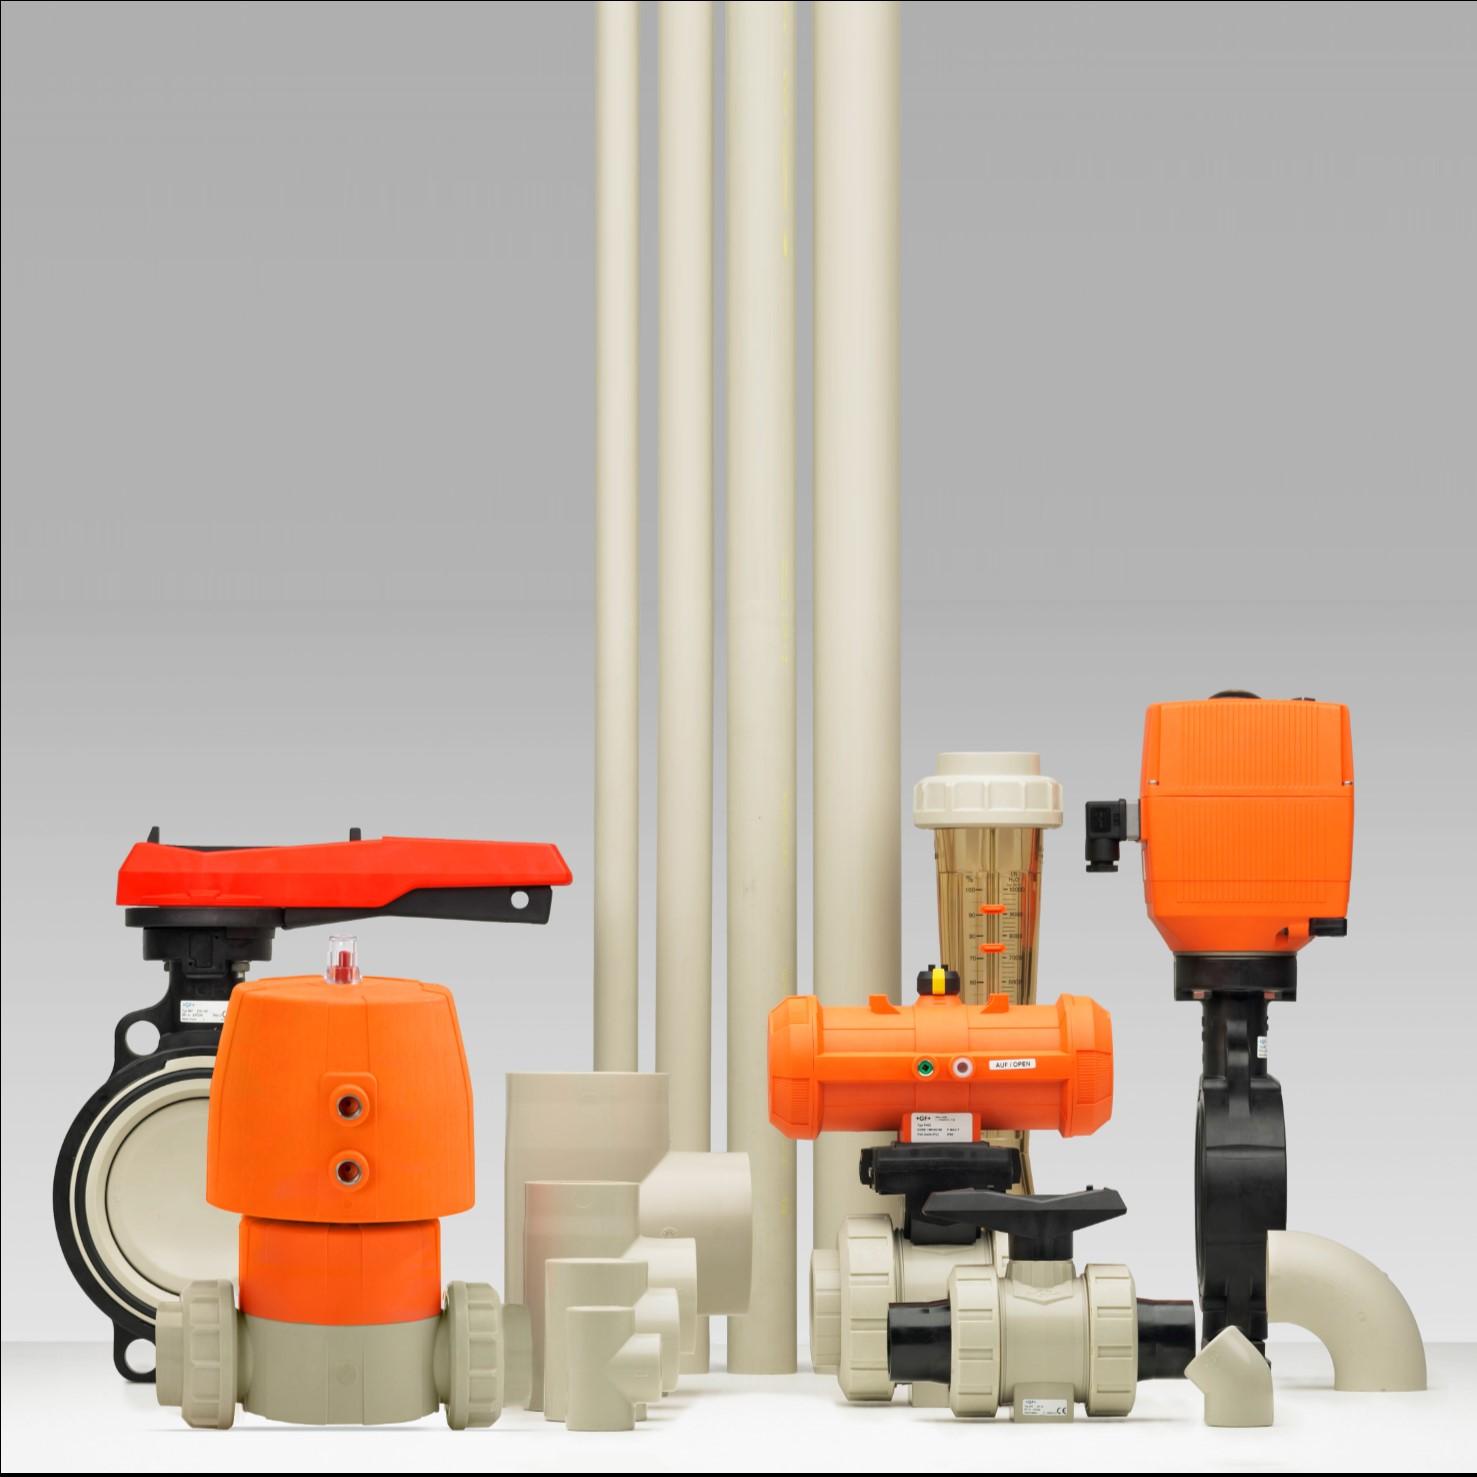 PP industriële kunststof leidingsystemen